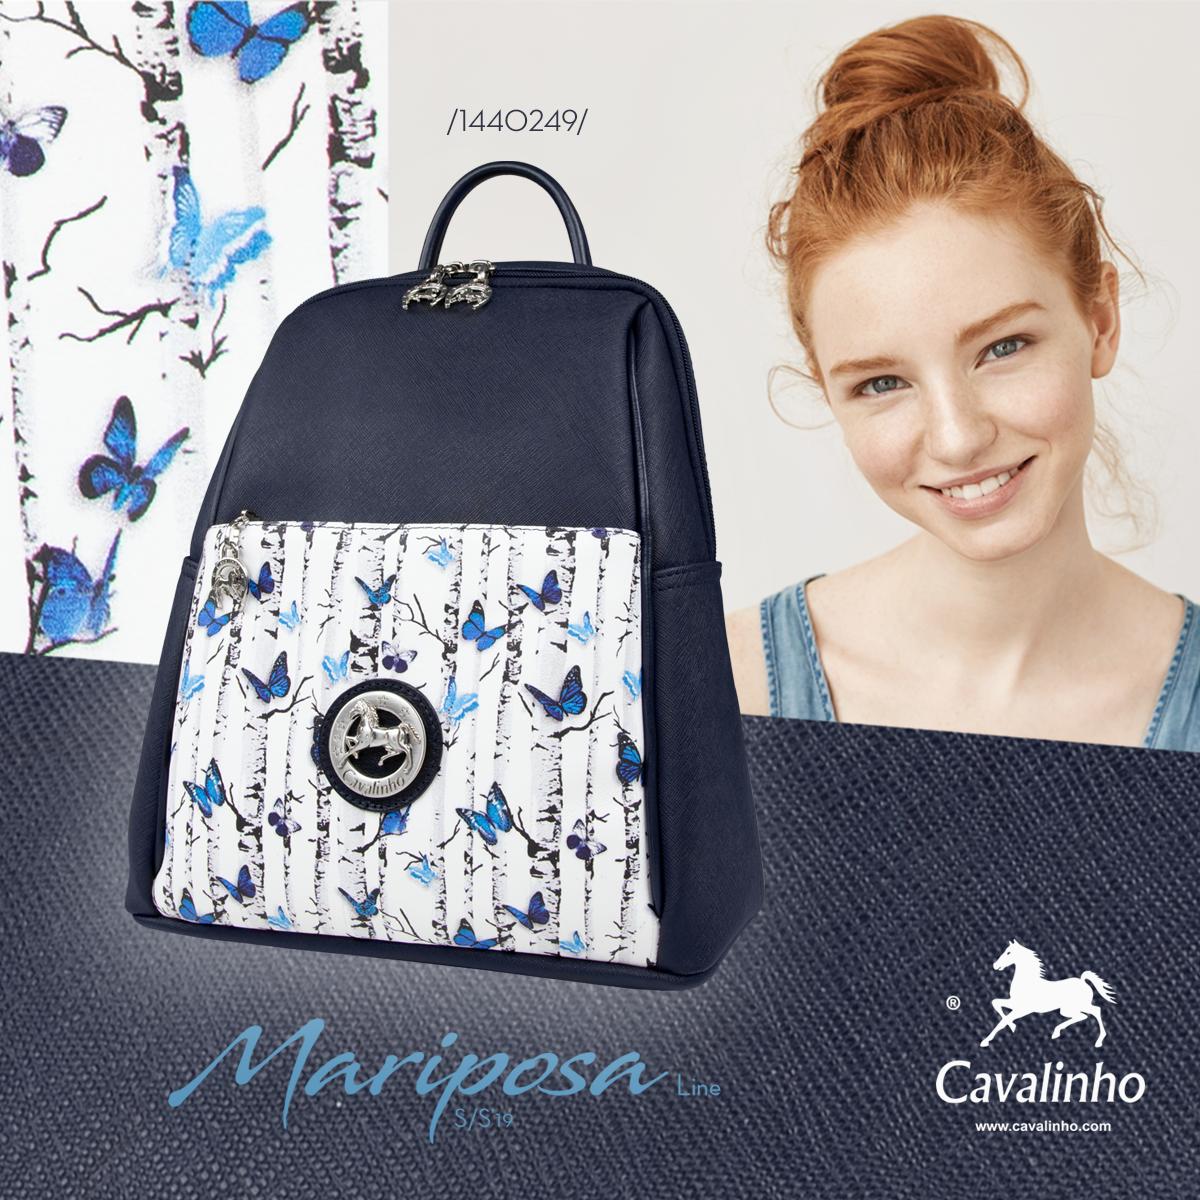 mariposa_post_05